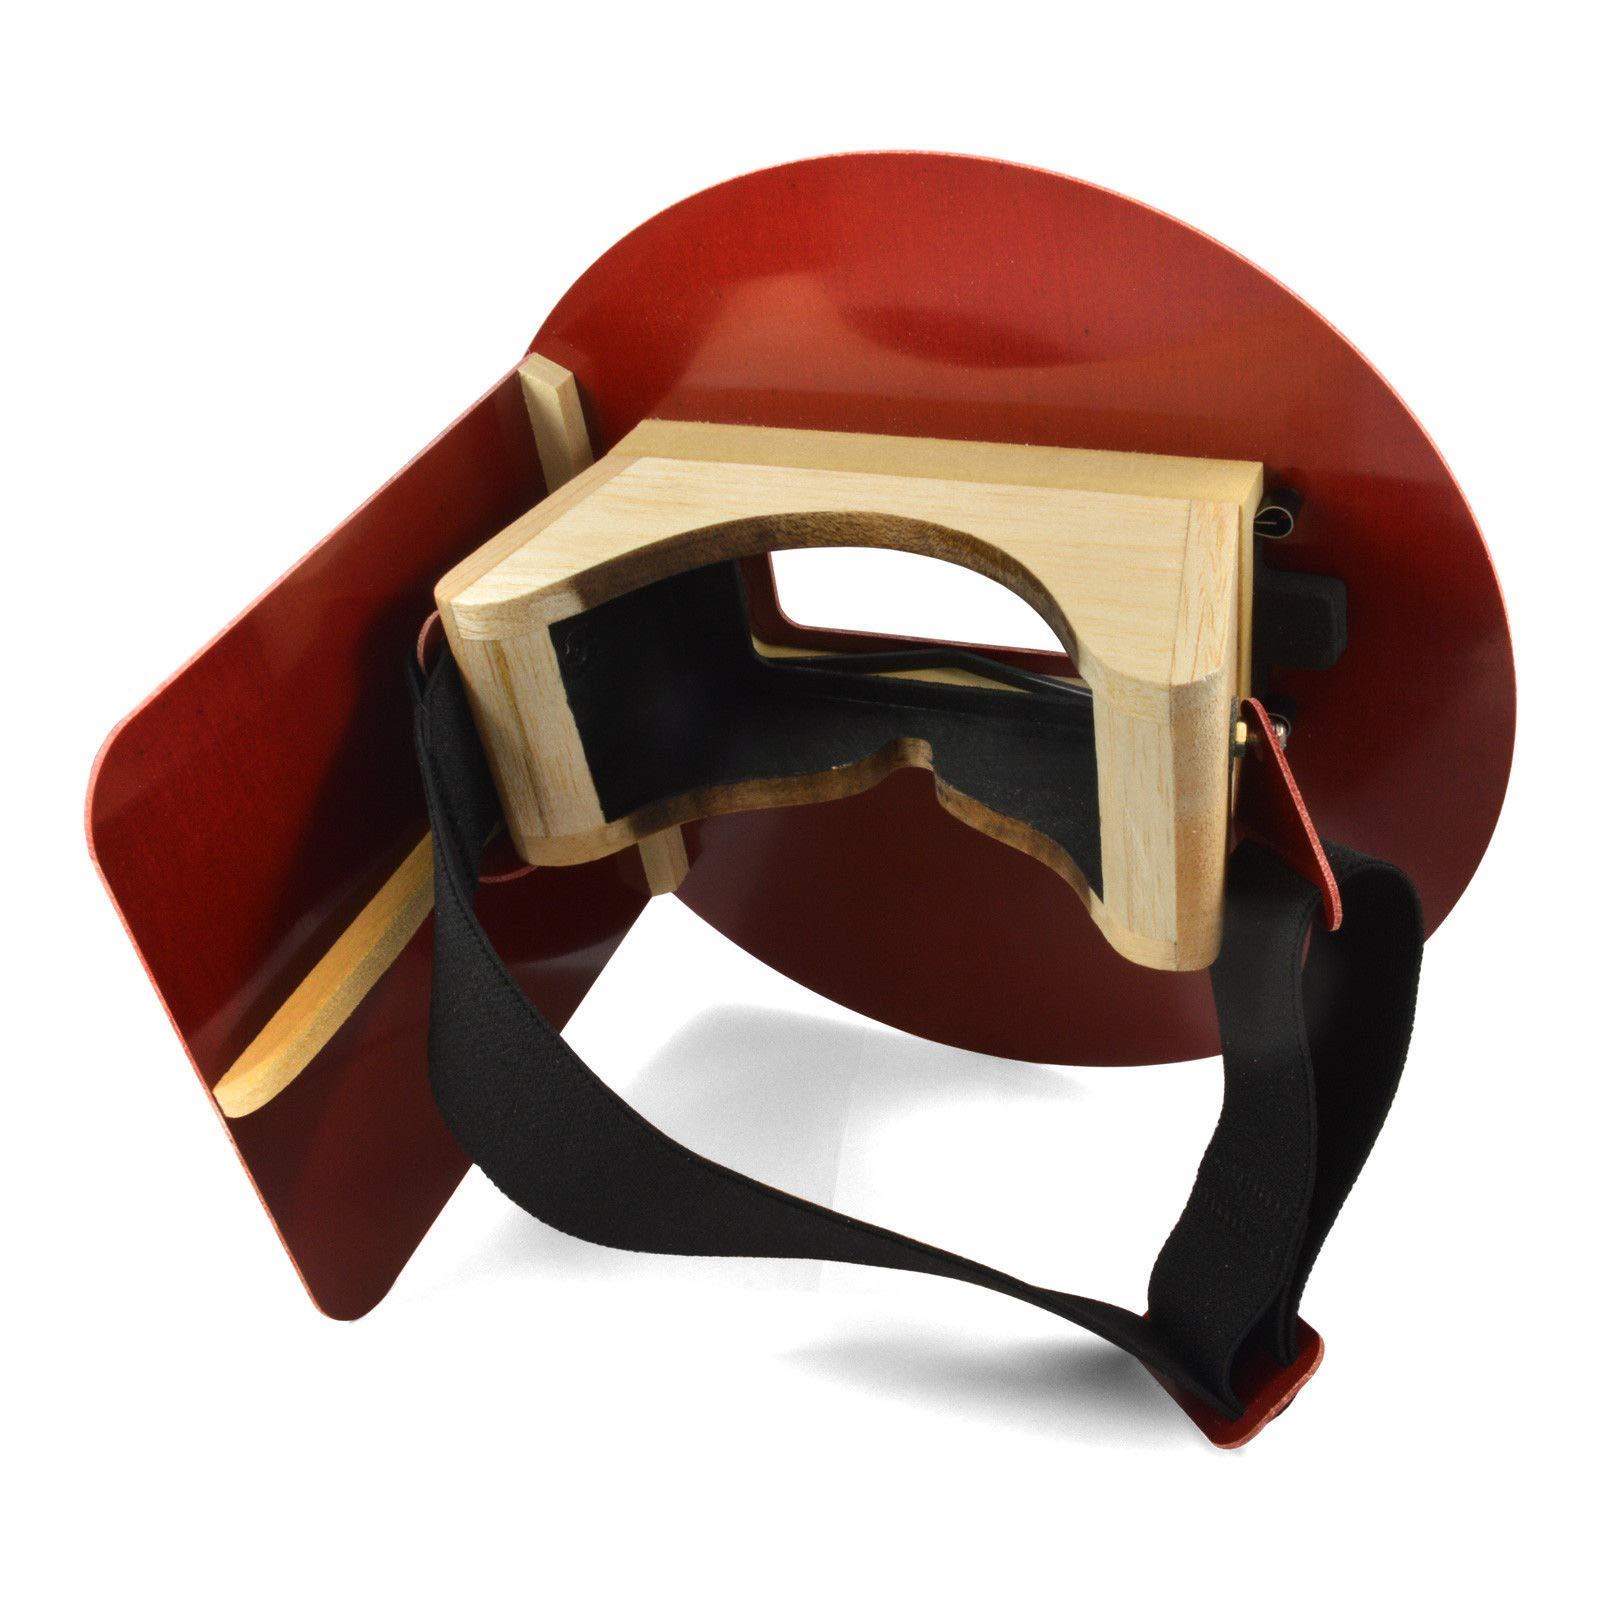 Wendy's Pancake Welding Hood Helmet w/Strap - Right Handed - RED